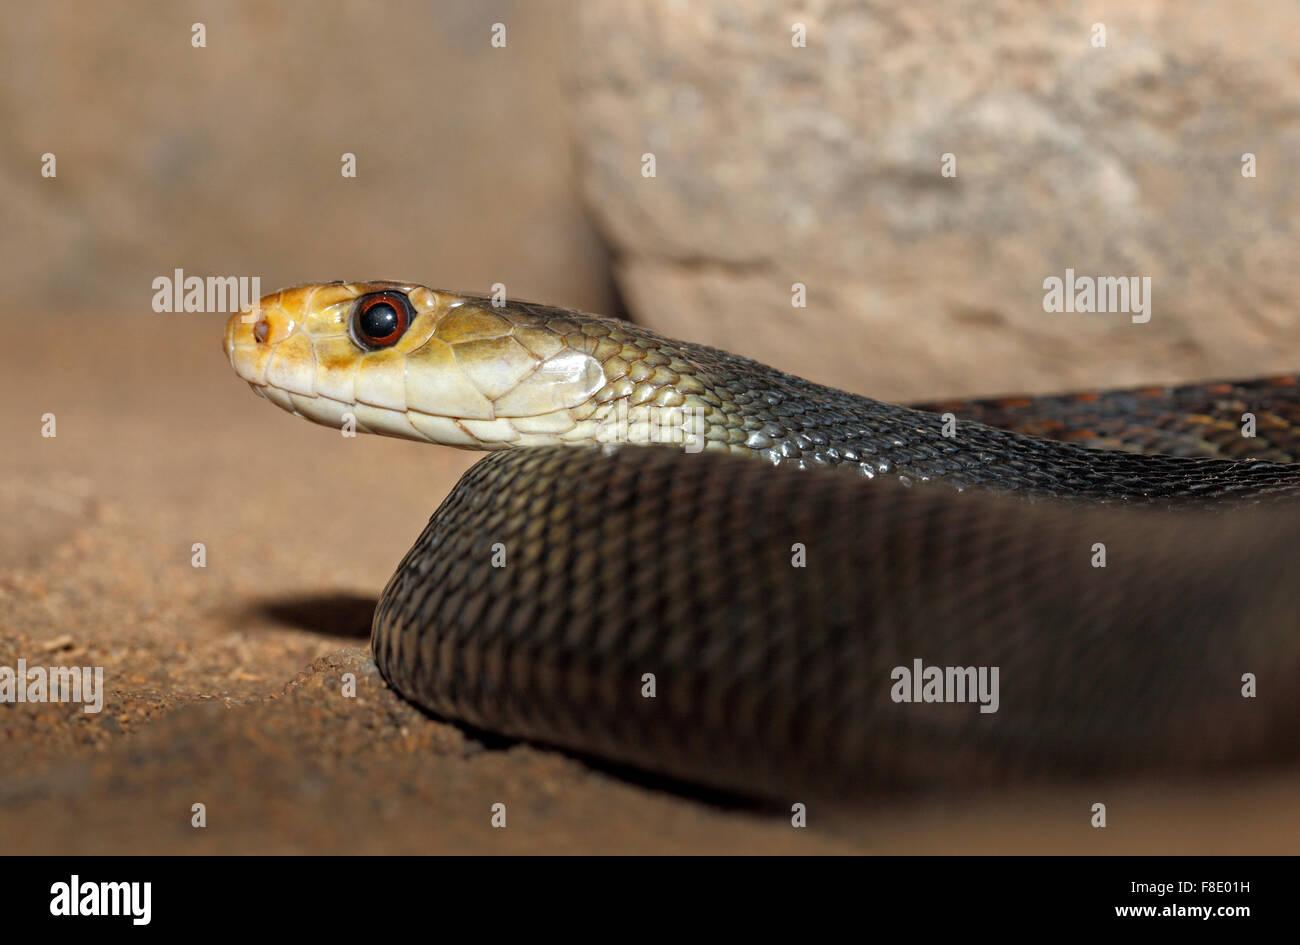 the-coastal-taipan-snake-oxyuranus-scutellatus-found-in-australia-F8E01H.jpg